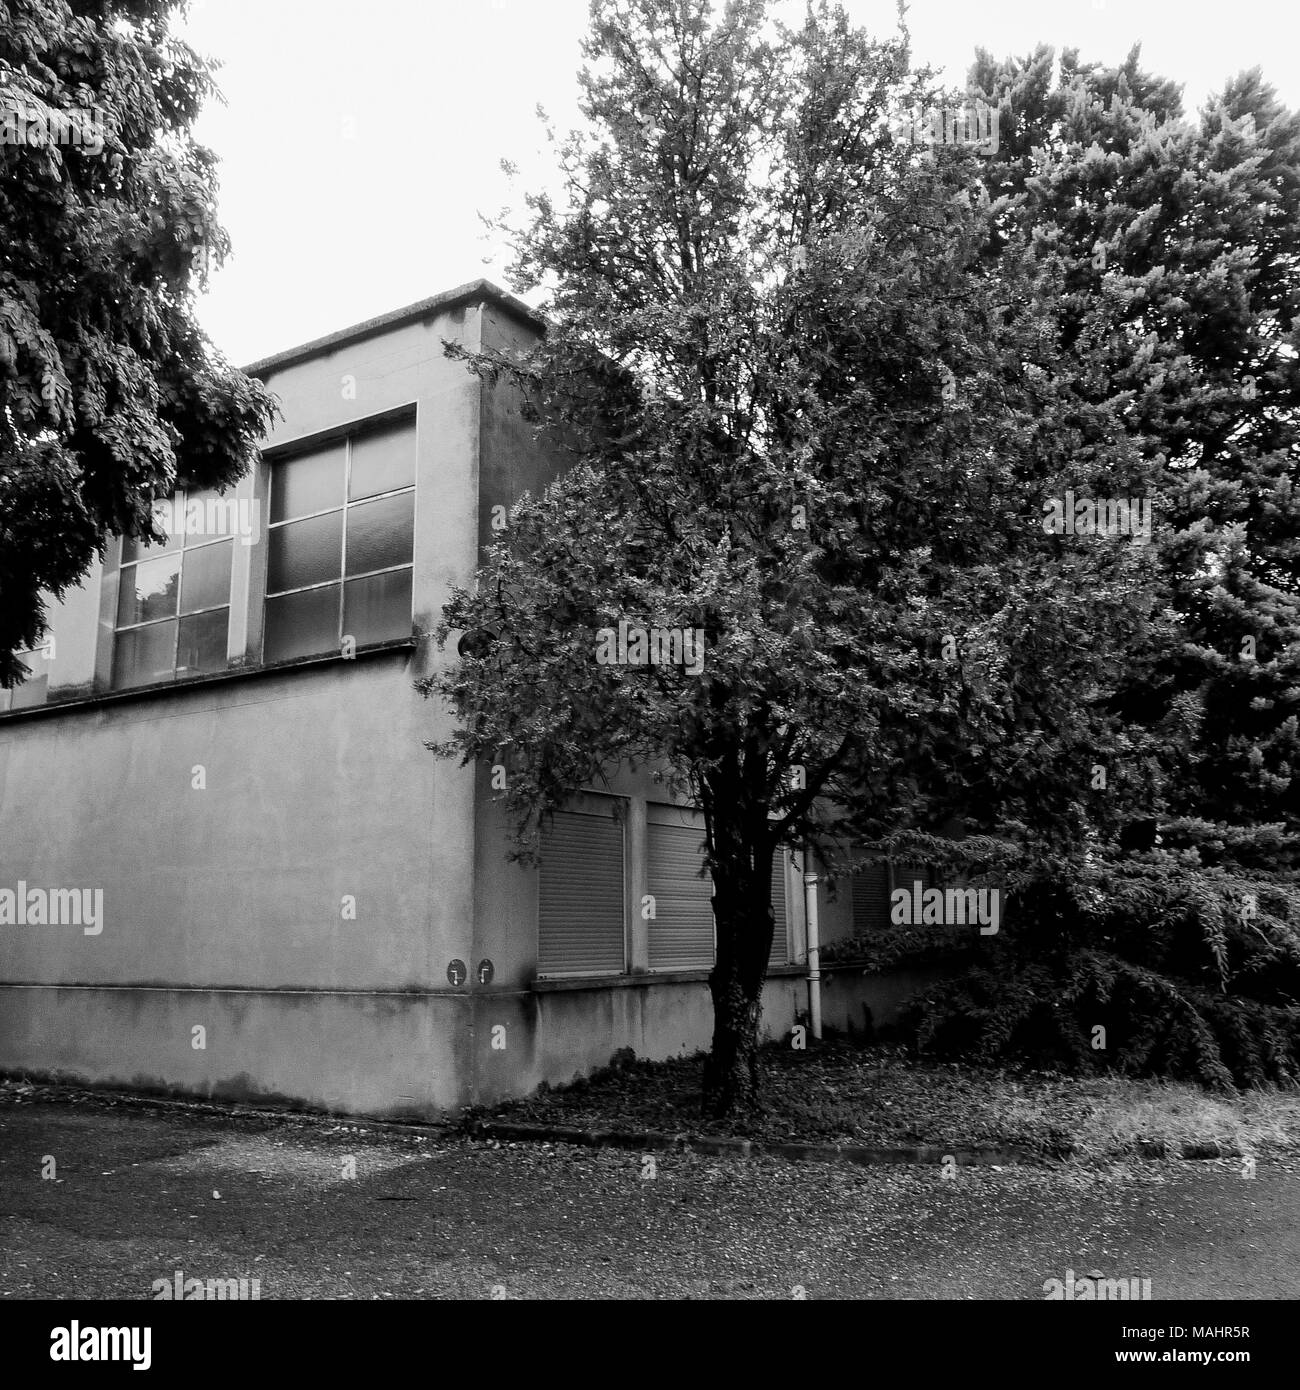 Autumn morning walk through Vinatier Psychiatric Hospital Park, Bron, France - Stock Image